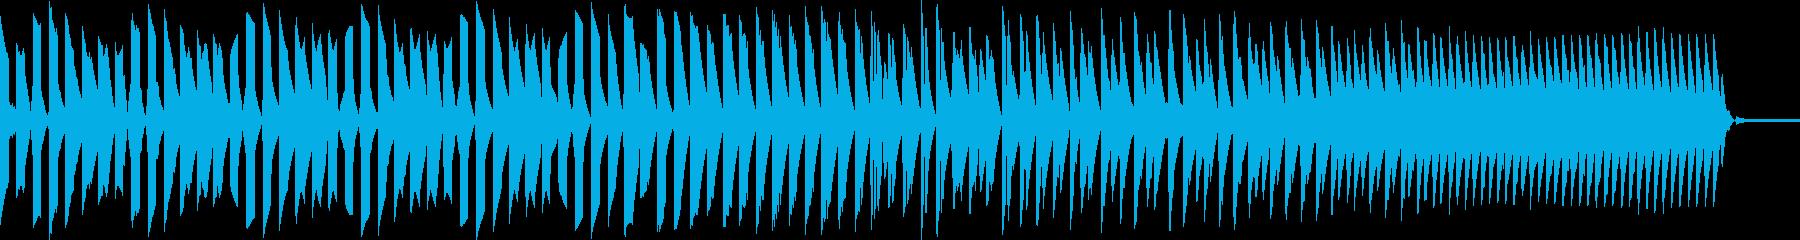 AMGアナログFX 3の再生済みの波形